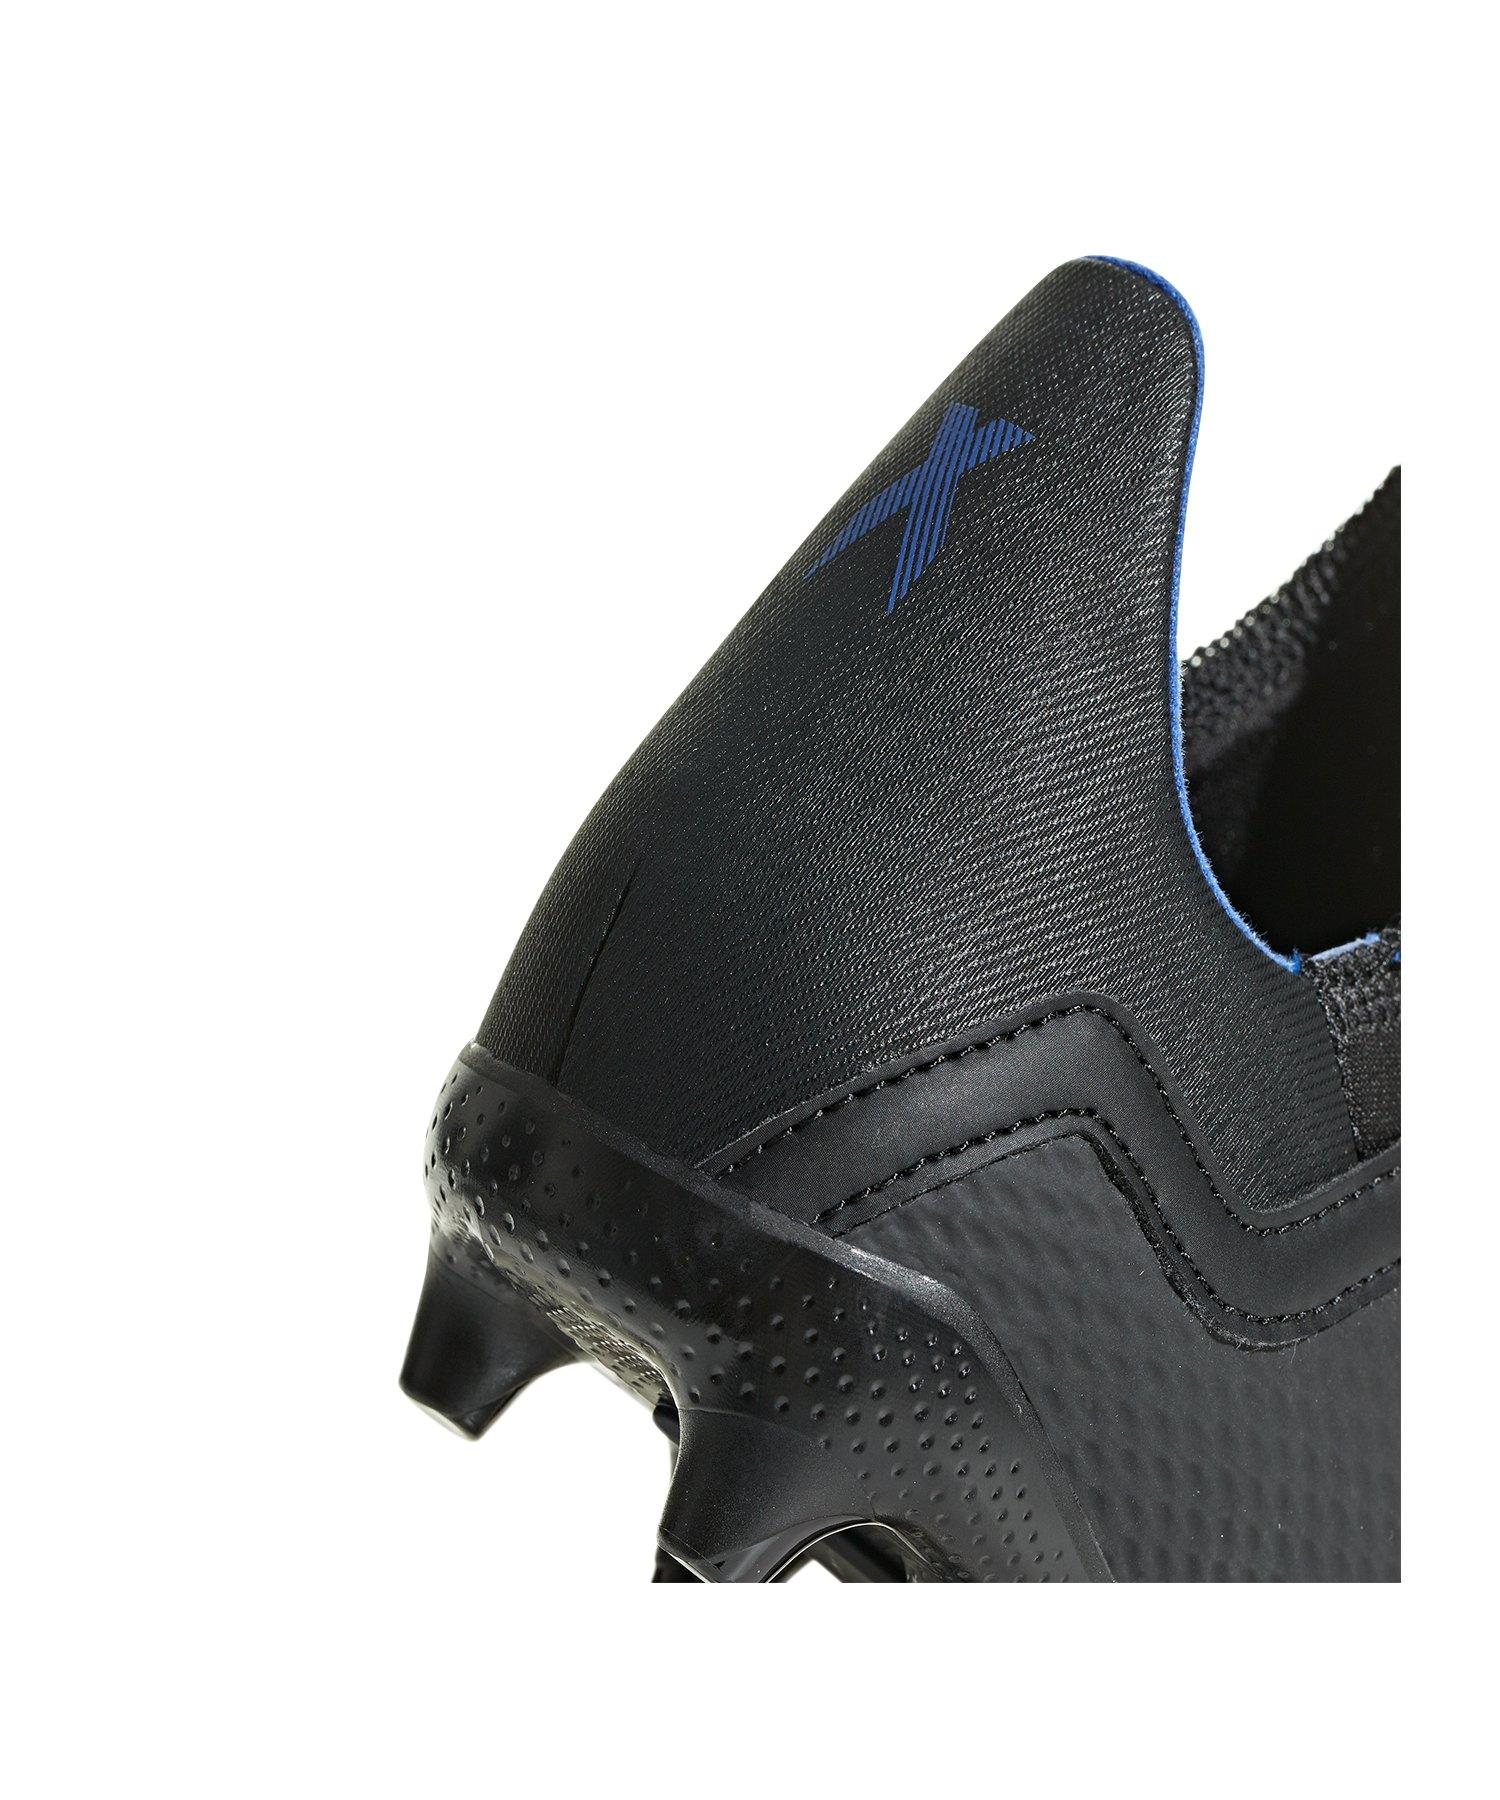 check out 804dc c1bb2 ... adidas X 18.3 FG J Kids Schwarz - schwarz ...